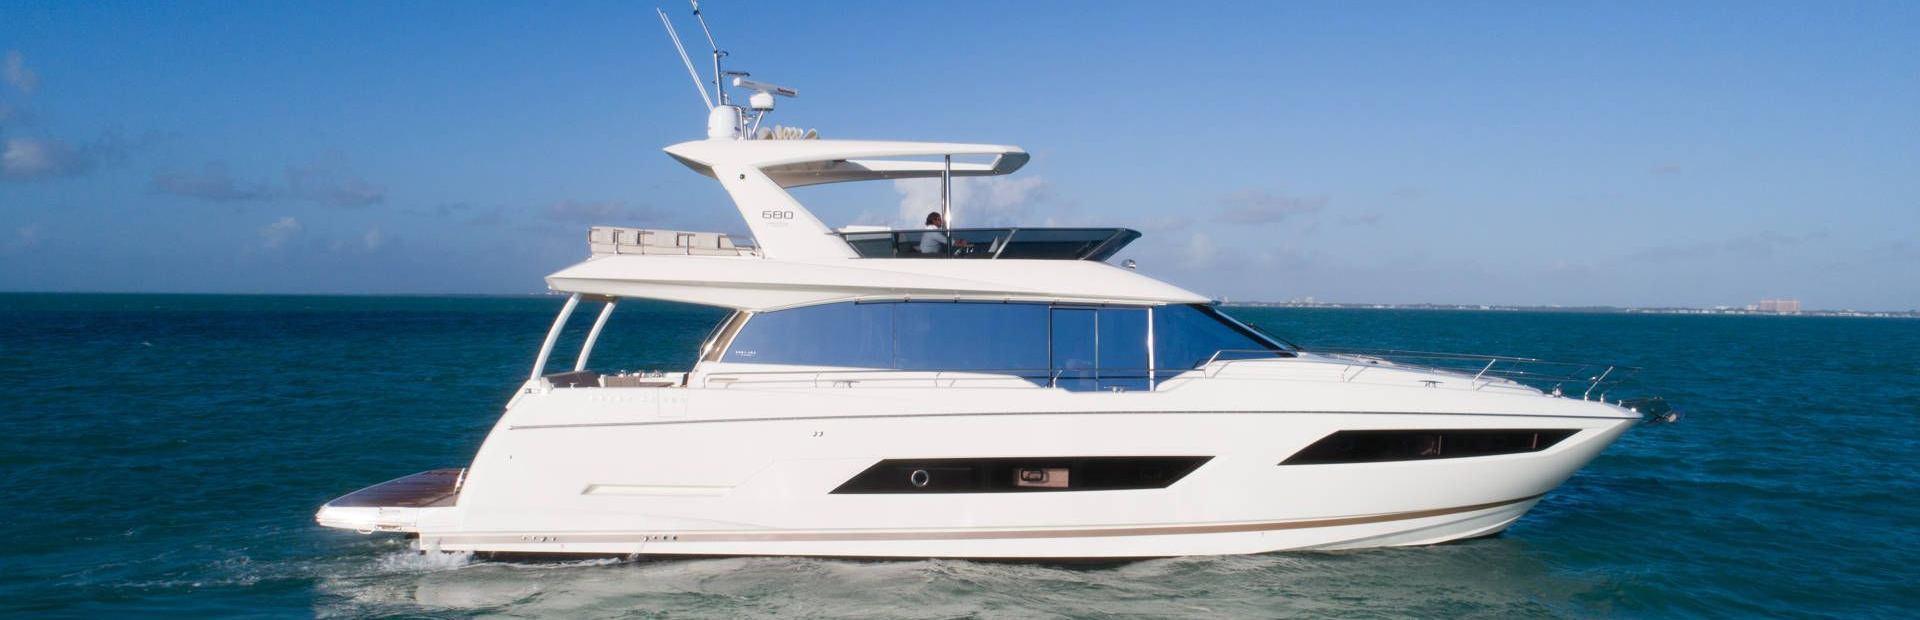 680 Yacht Charter